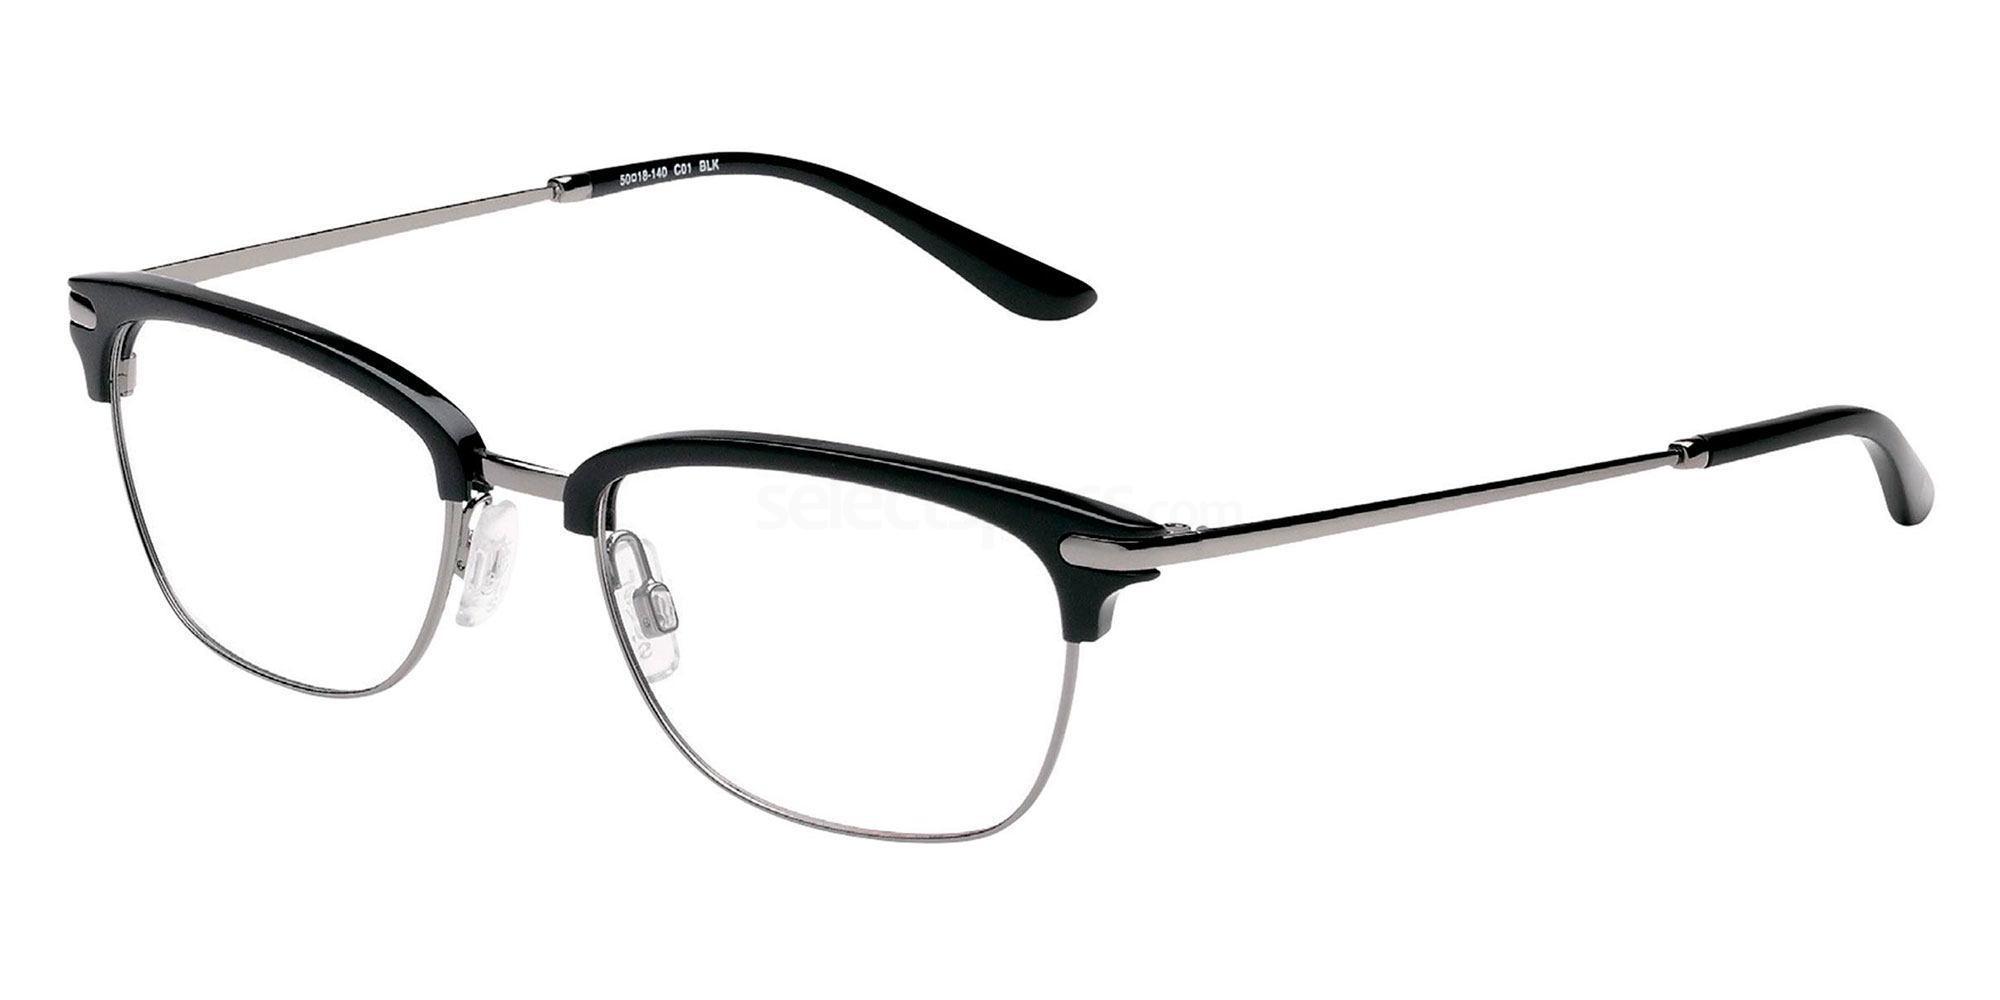 01 BLK LS112 Glasses, Levi's Eyewear